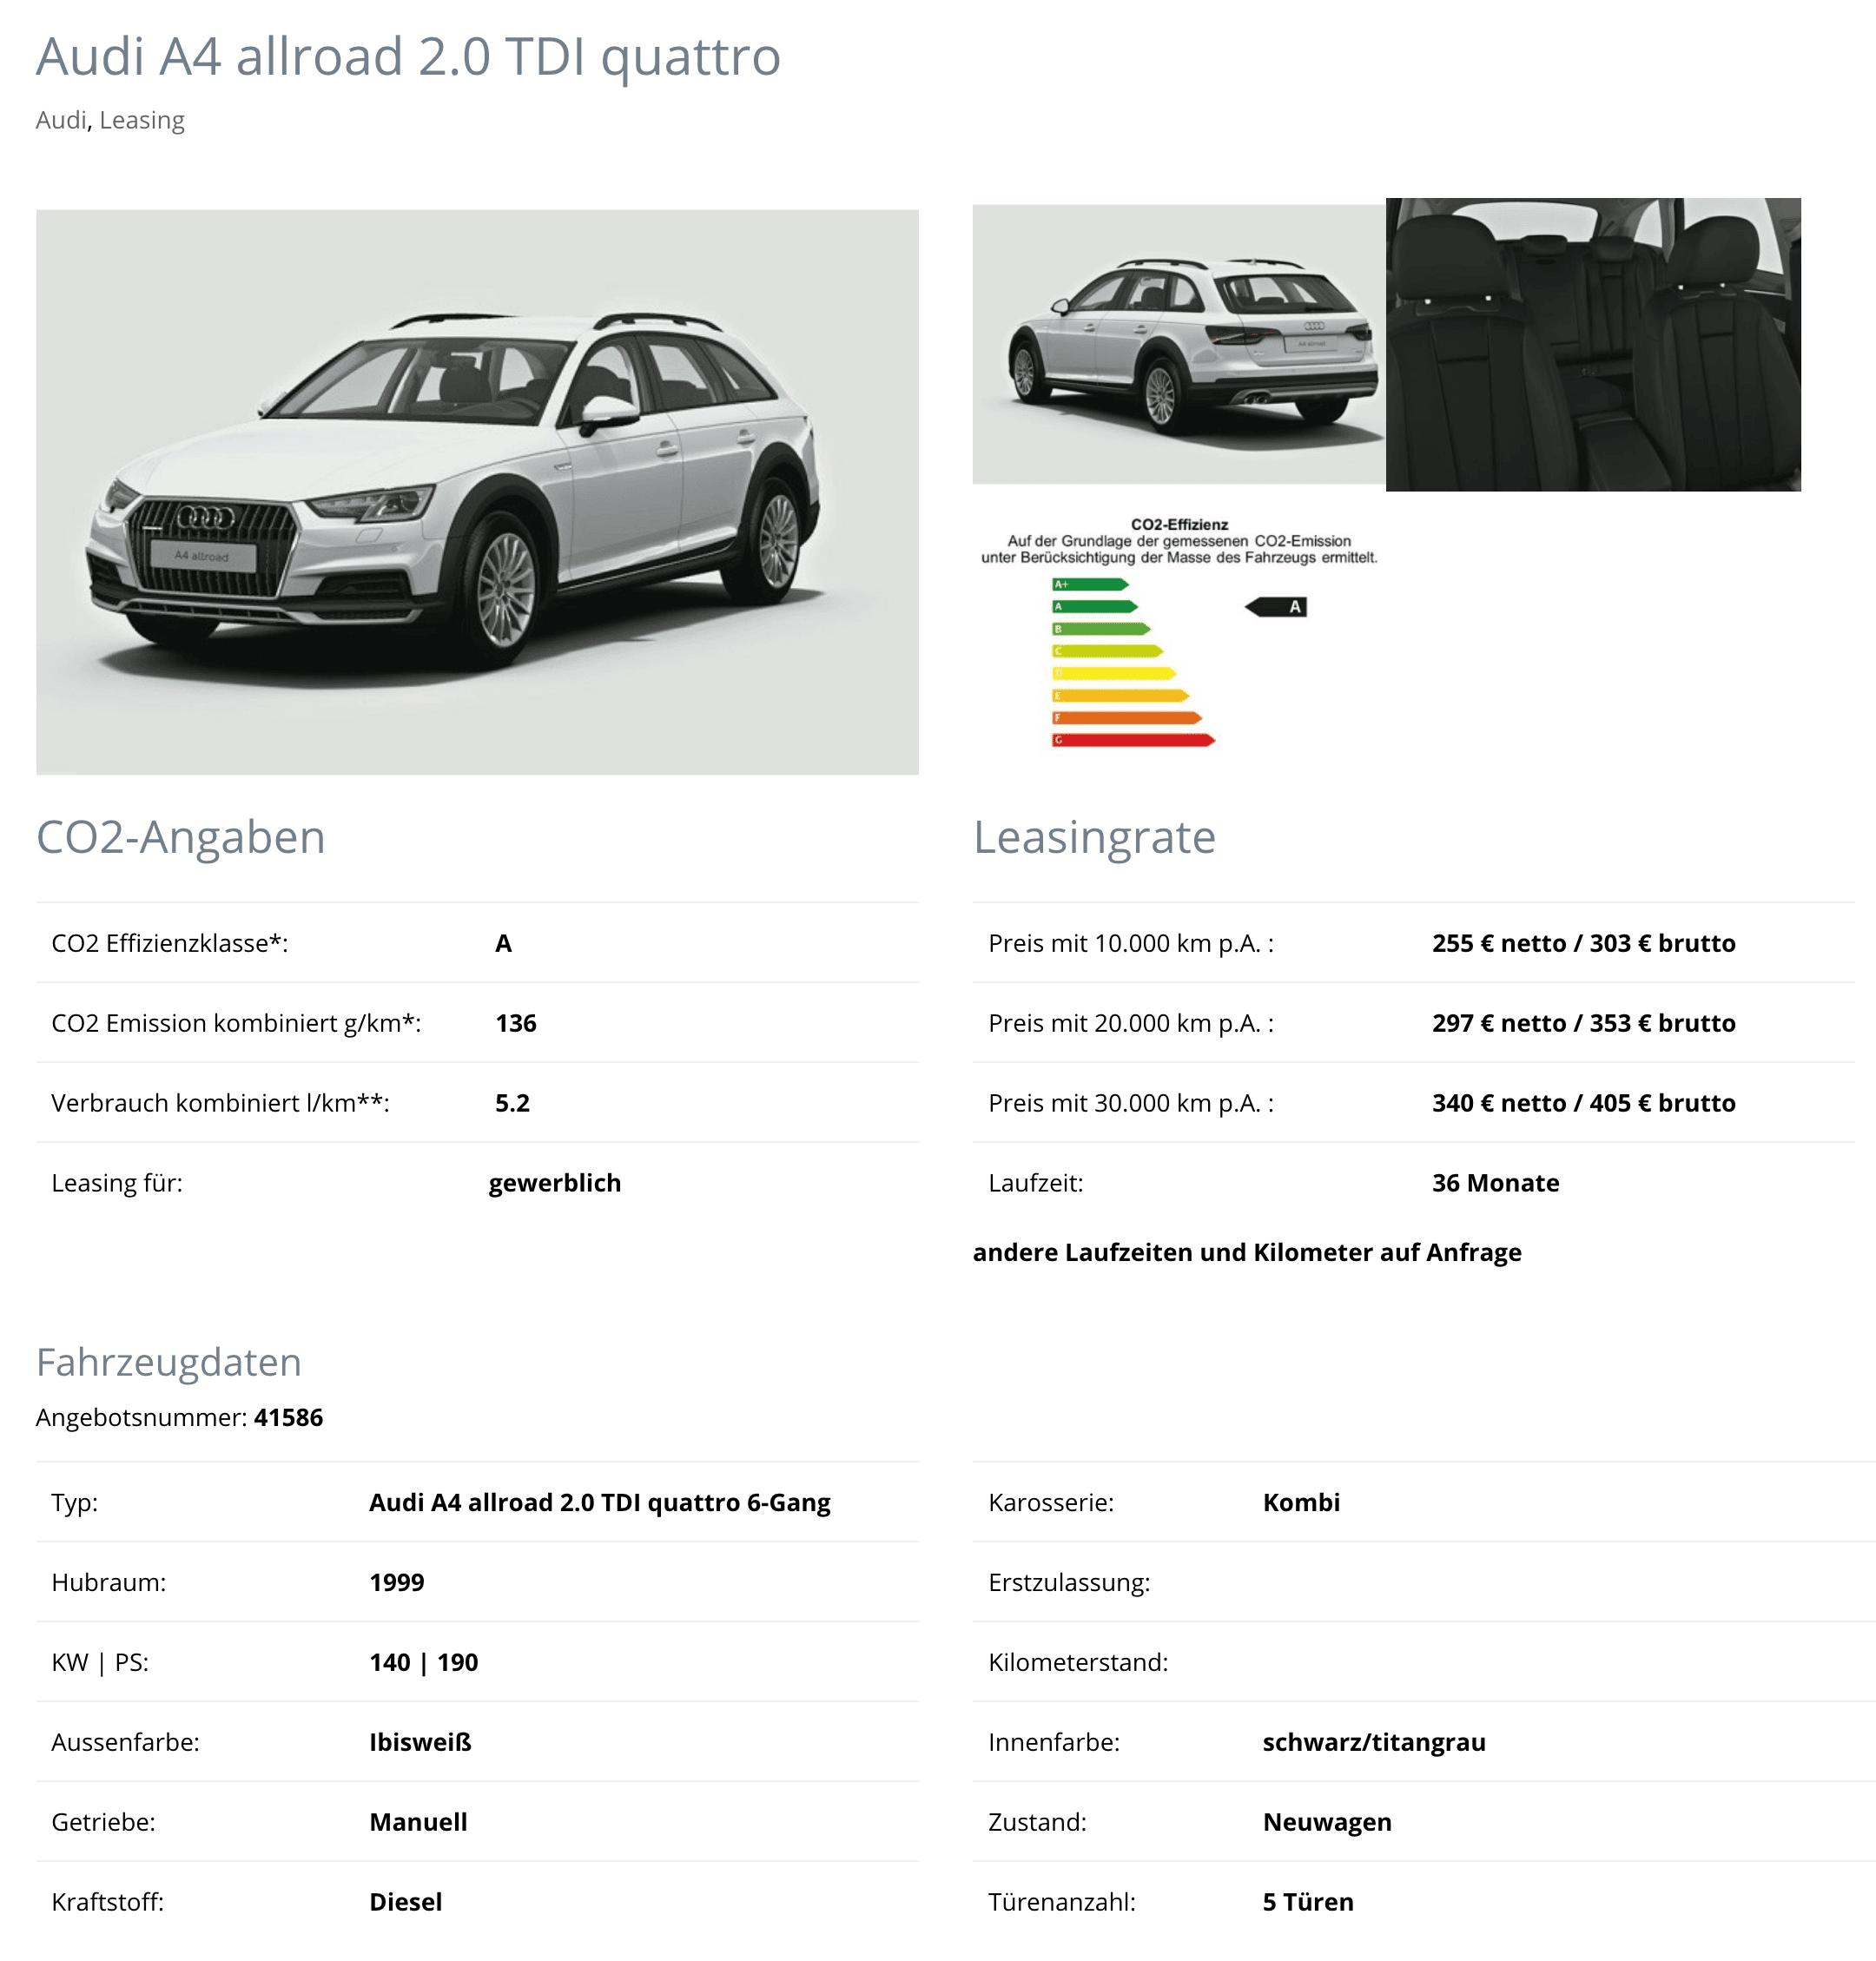 Audi A4 Allroad Quattro Leasing Ab 255 Euro Im Monat Netto